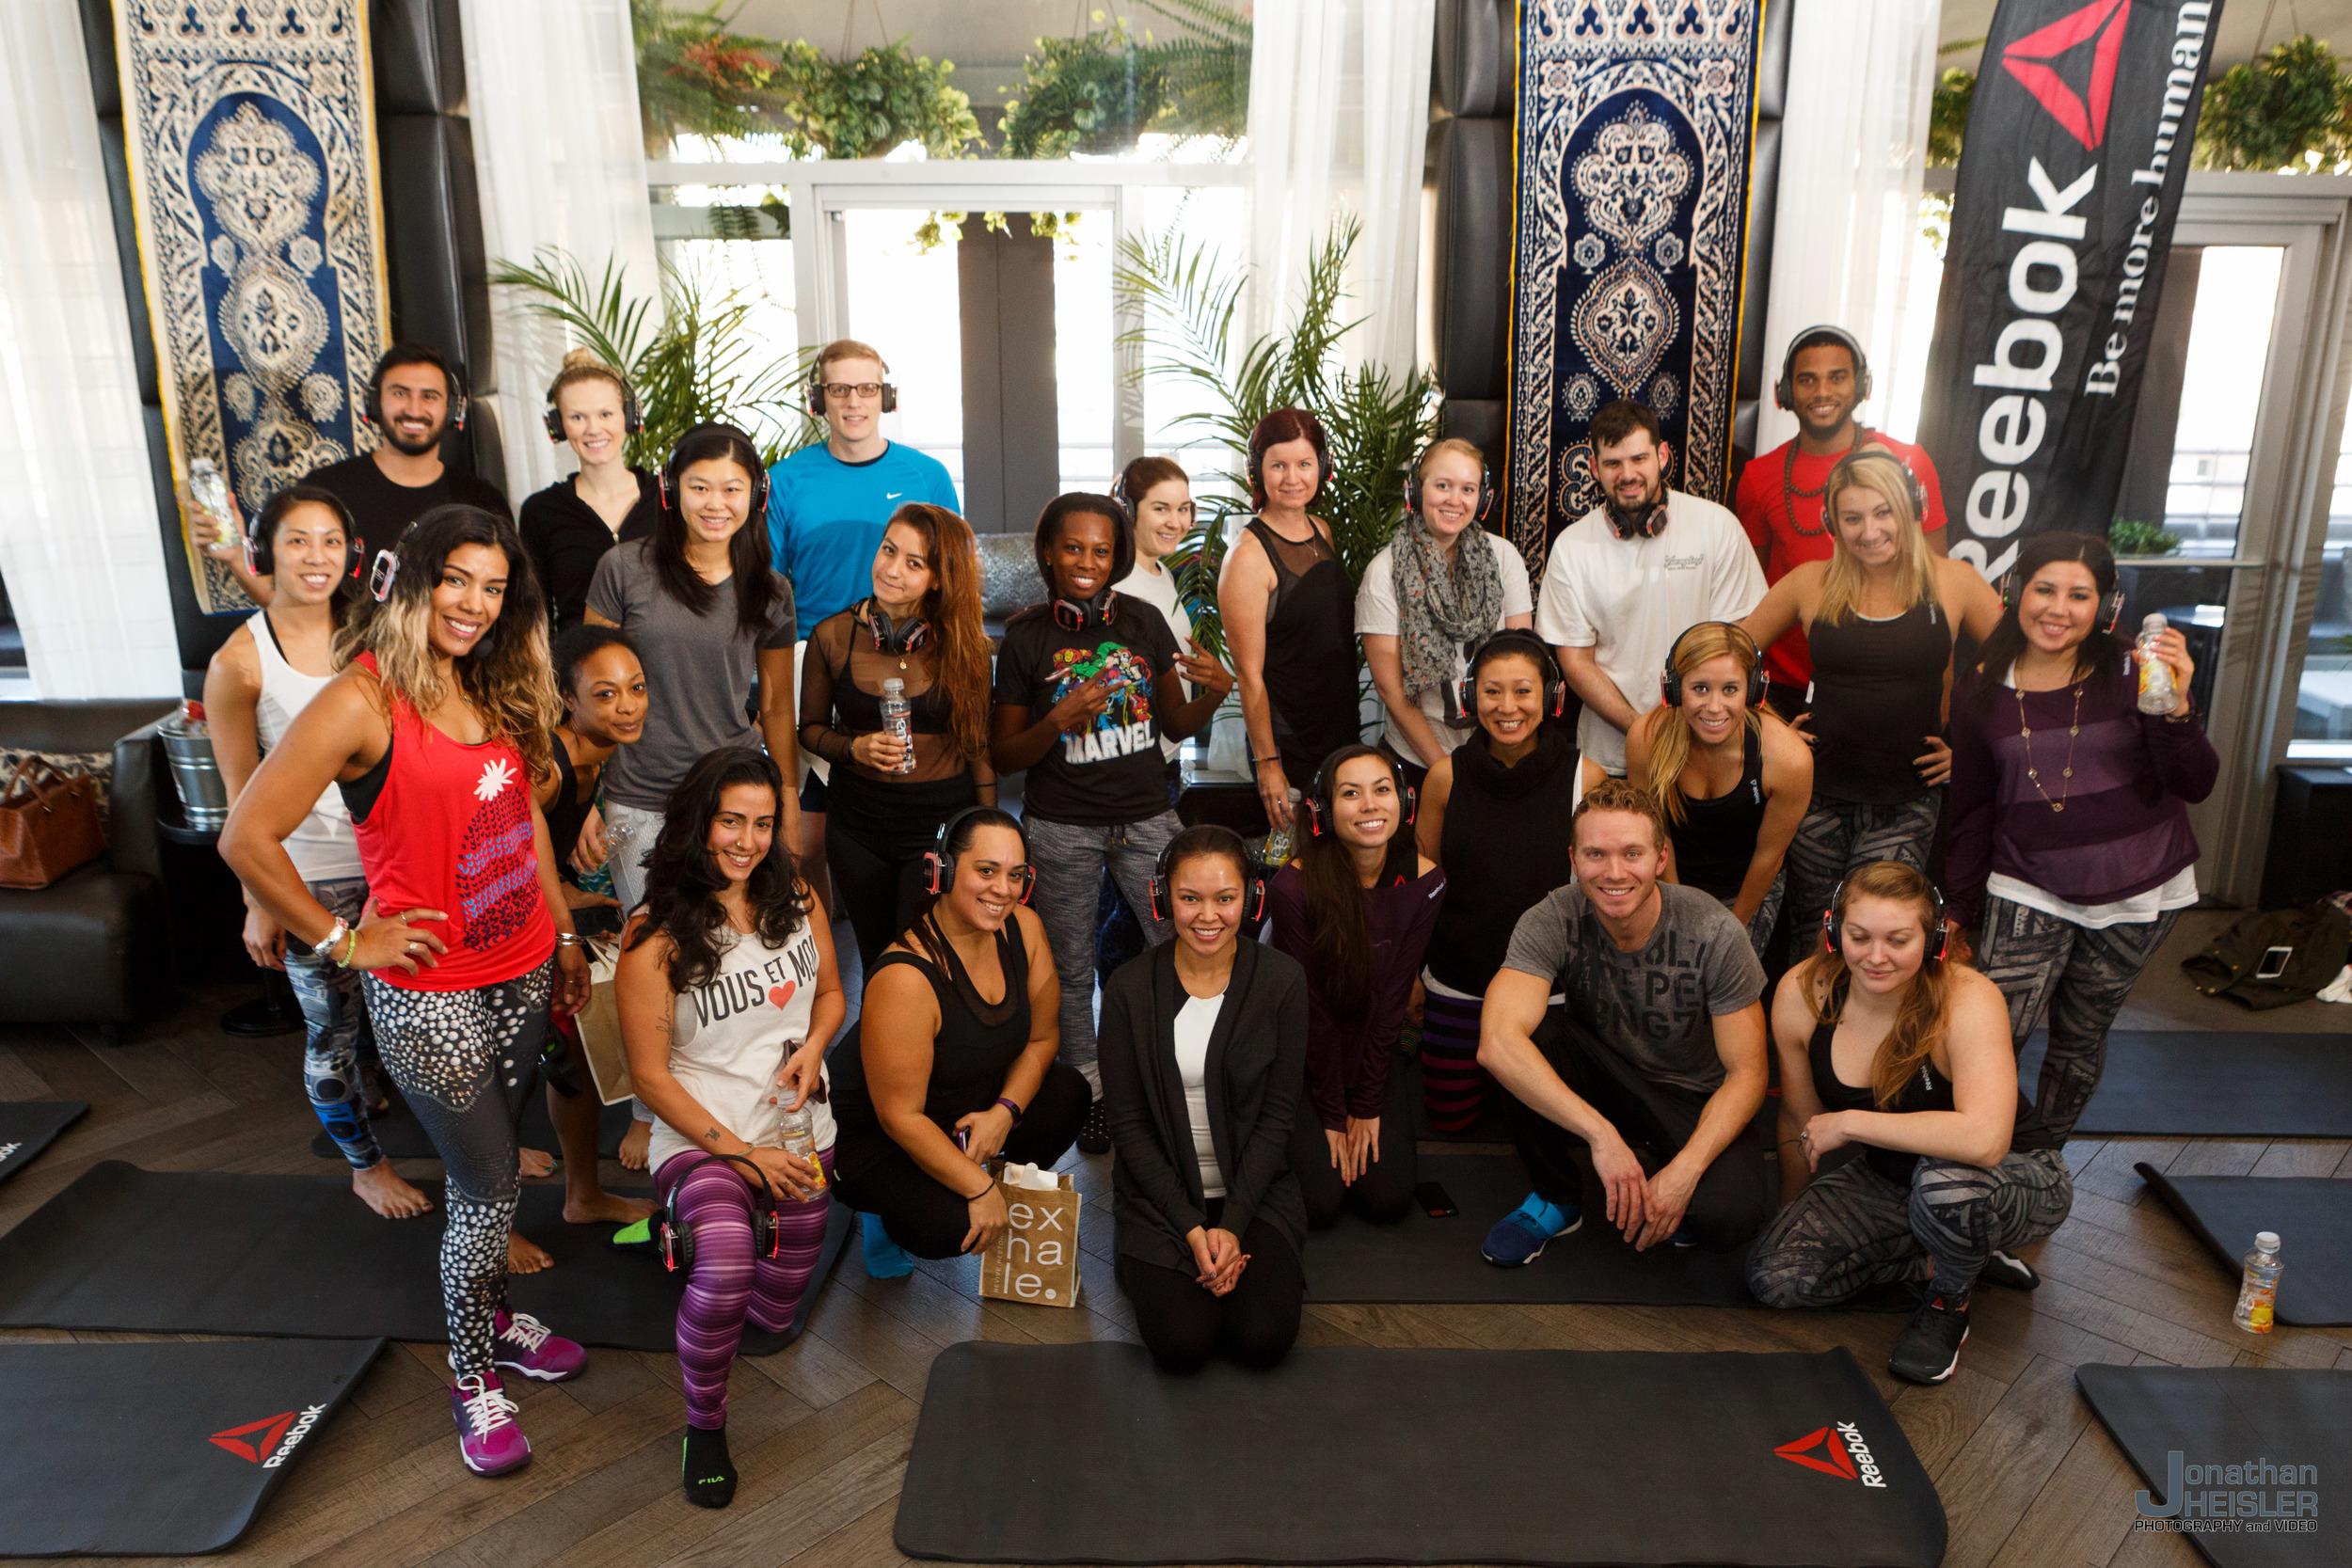 Reebok NYC Yoga_ Gansevoort Hotel NYC __  Jonathan Heisler _ 11.21.2015_018f_5.0.jpg